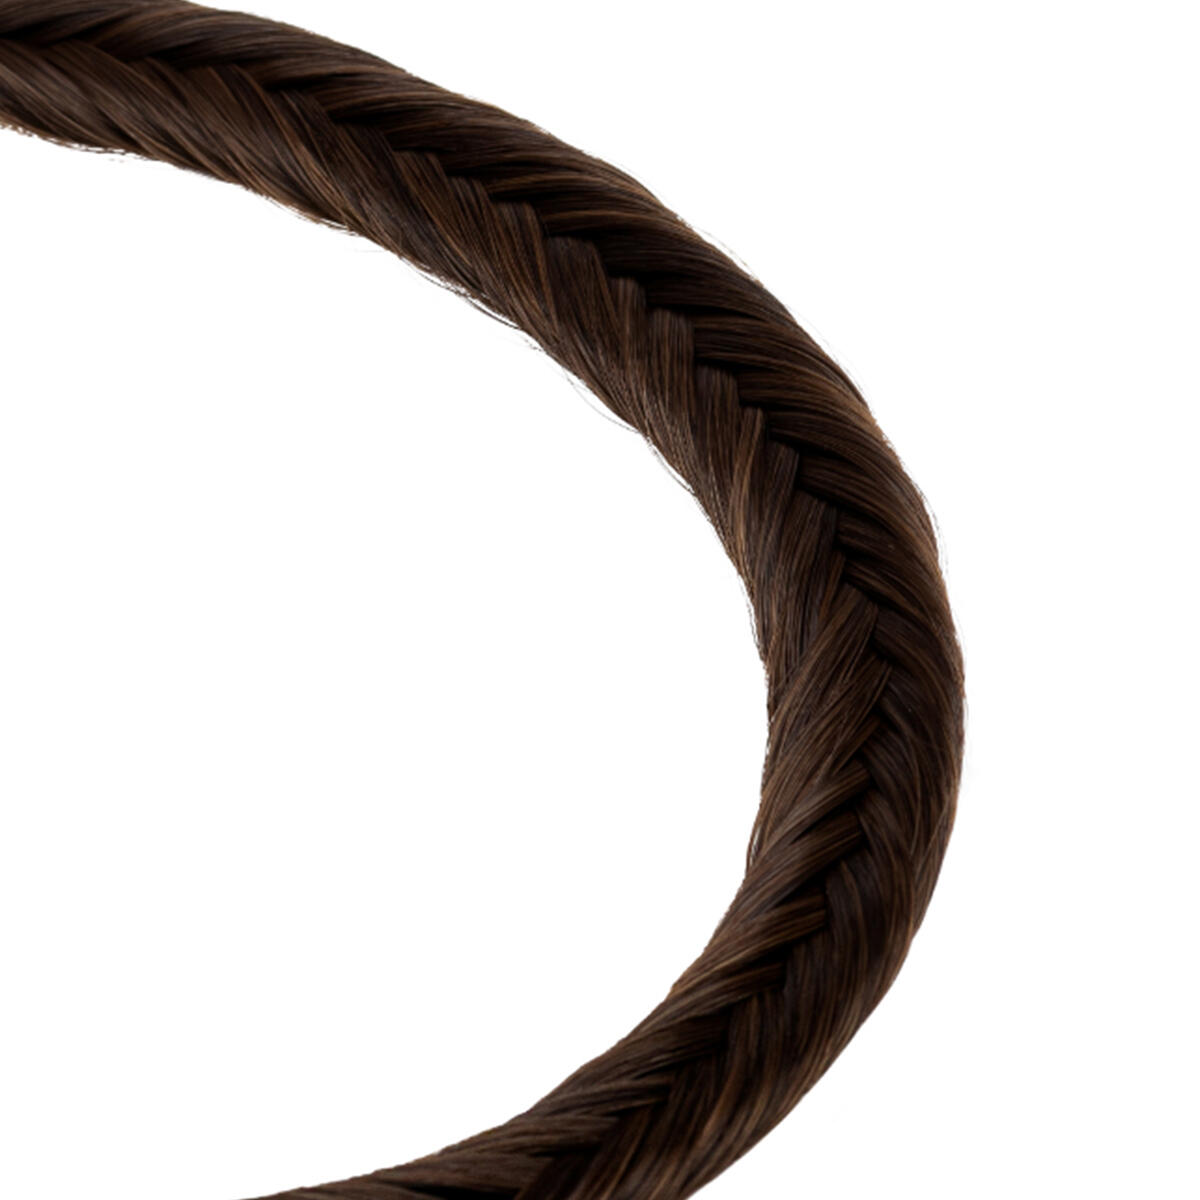 Synthetic Braided Headband 2.2 Coffee Brown 0 cm